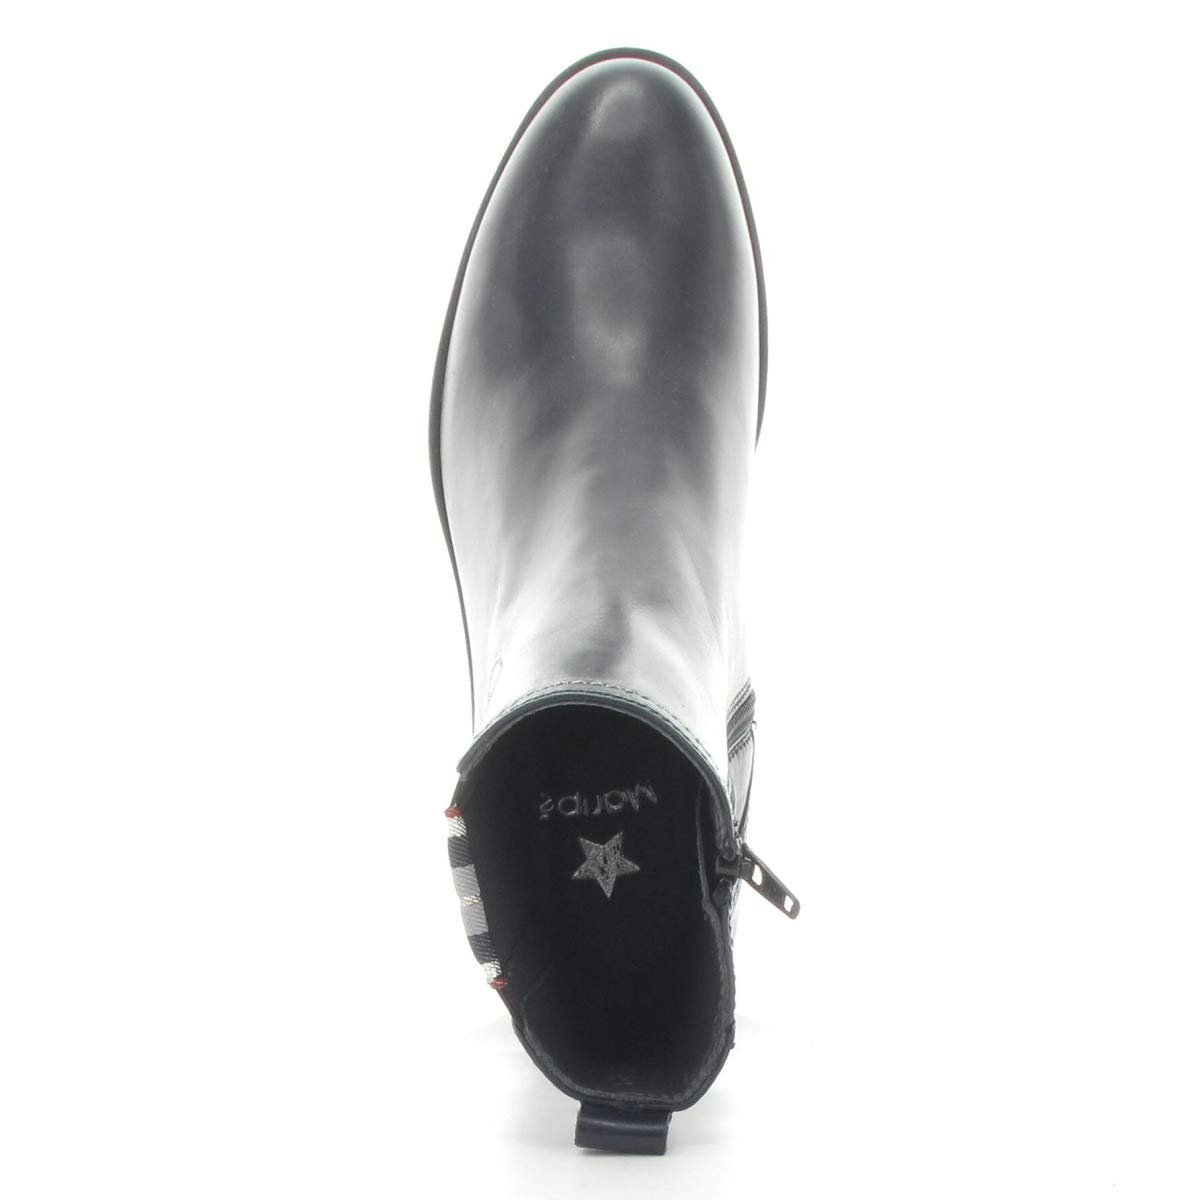 MARIPE 27690-173548 Chelsea Stiefel Stiefel Stiefel mit dünner Gummisohle - Obermaterial Nappaleder navy blau - Lederfutter - Made in  6fc7e9